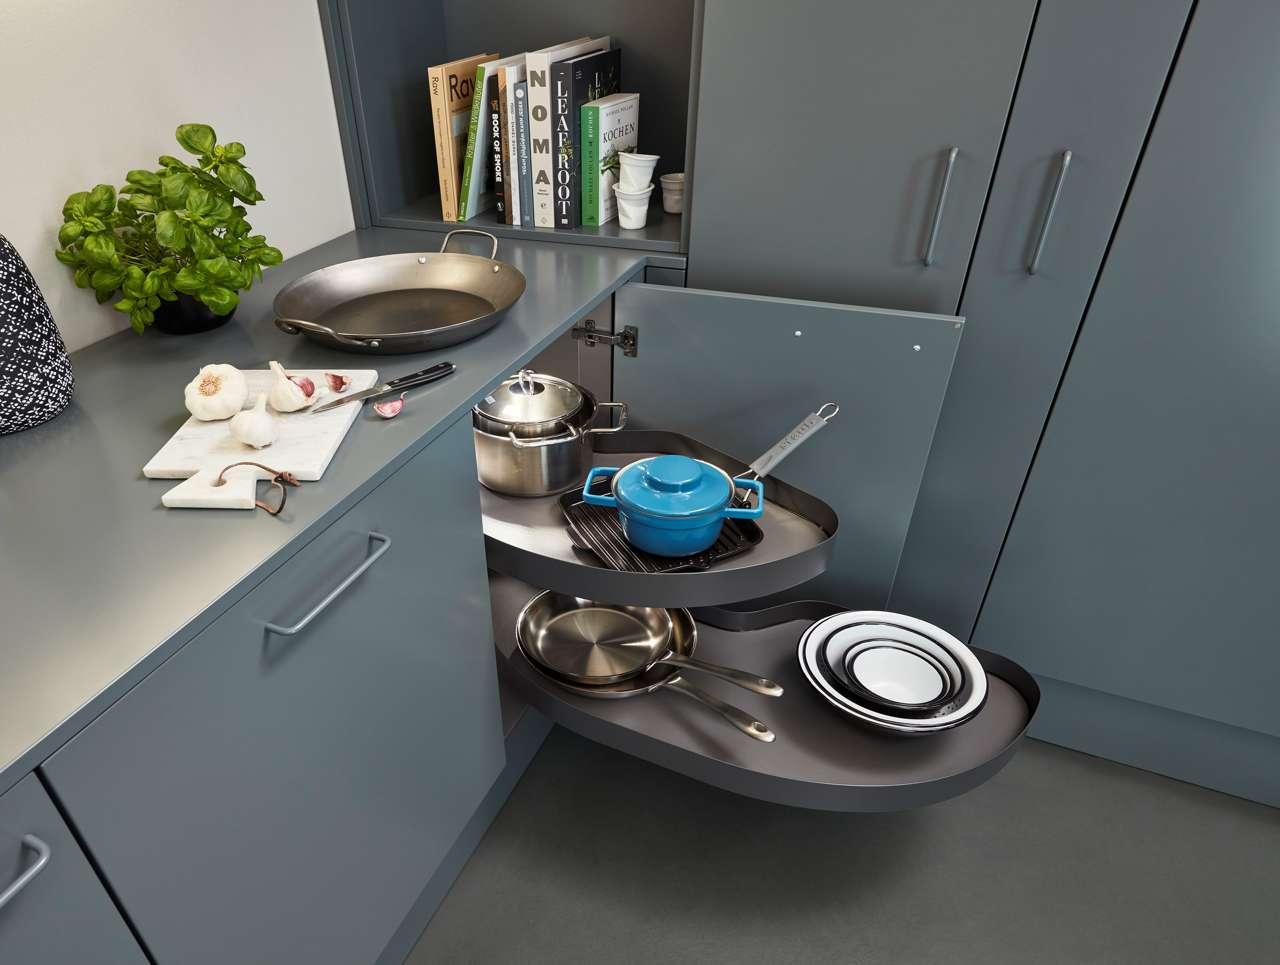 kleine k che gro e wirkung k chen journal. Black Bedroom Furniture Sets. Home Design Ideas